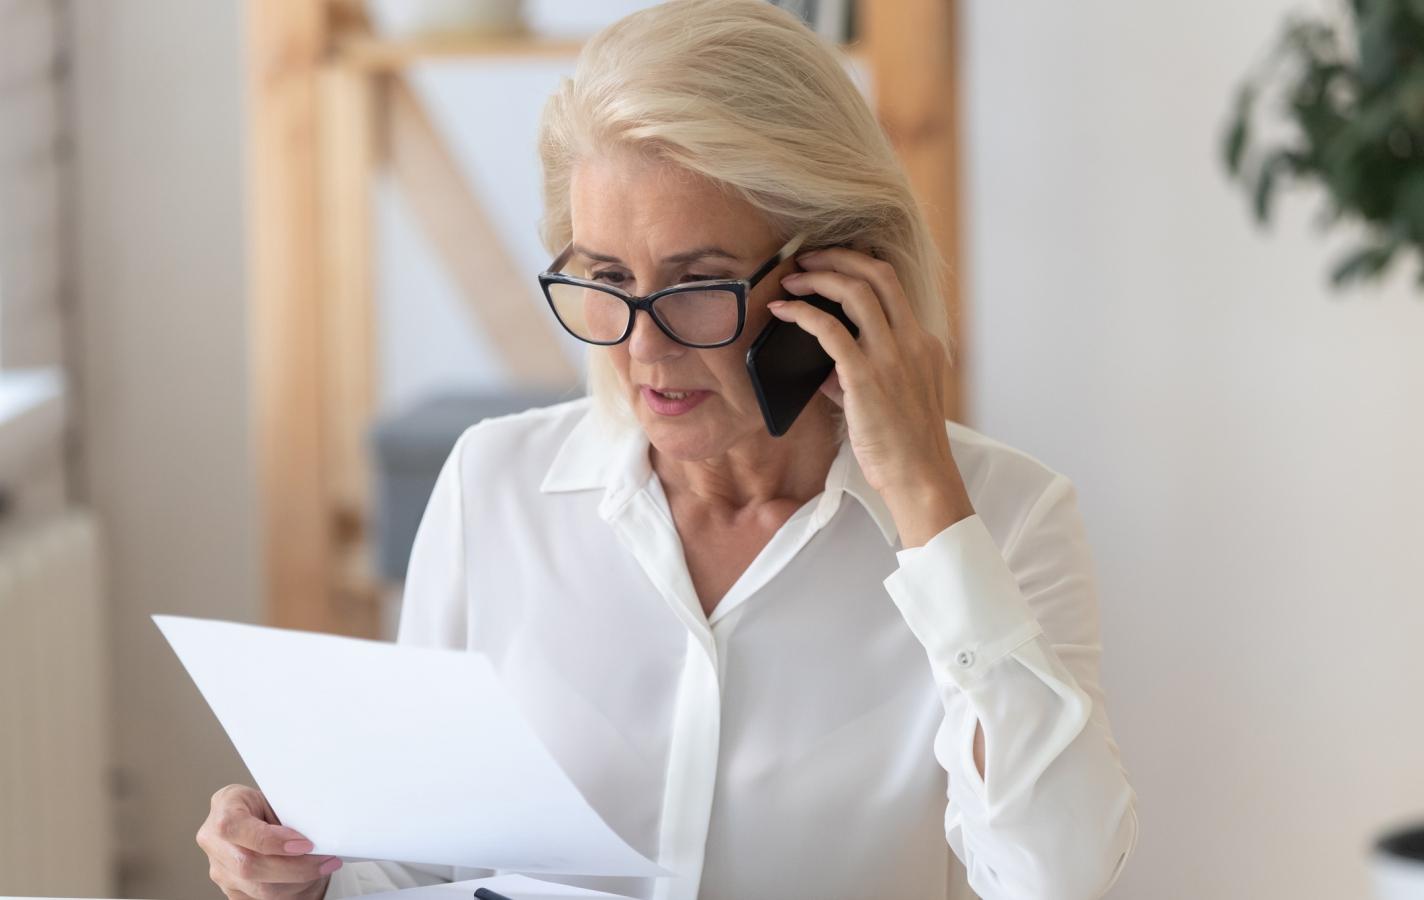 Serious senior woman talk on cellphone discussing paperwork